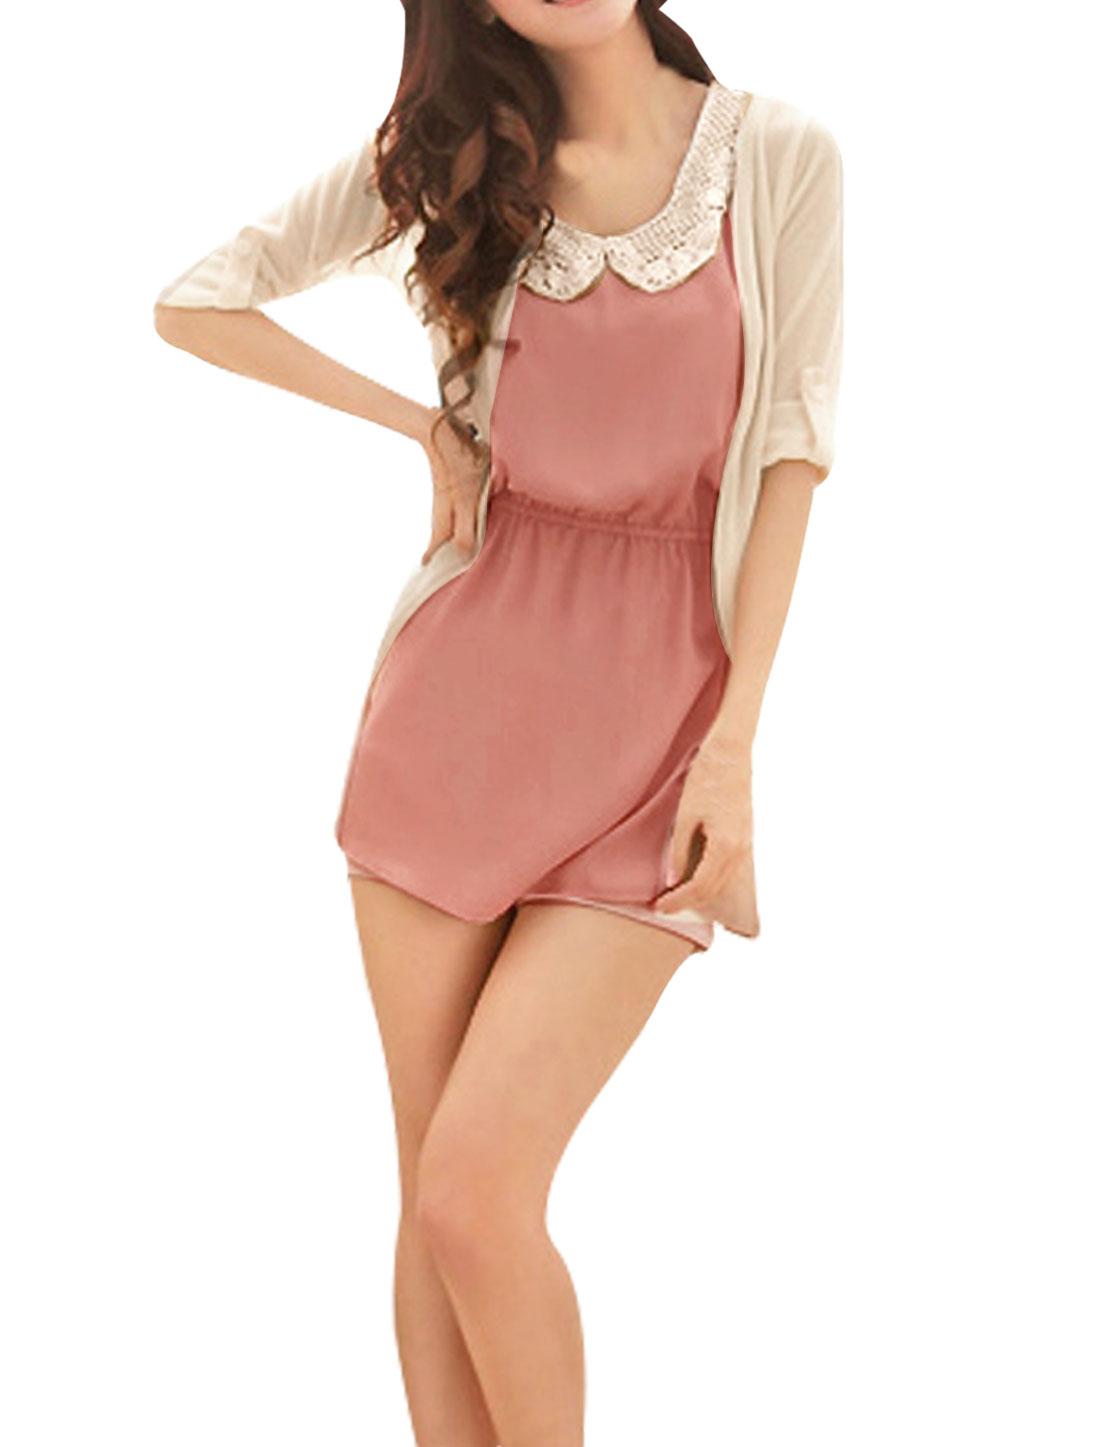 Woman Pink Scoop Neck Elastic Waist Mini Dress w Long Sleeve Beige Cardigan XL